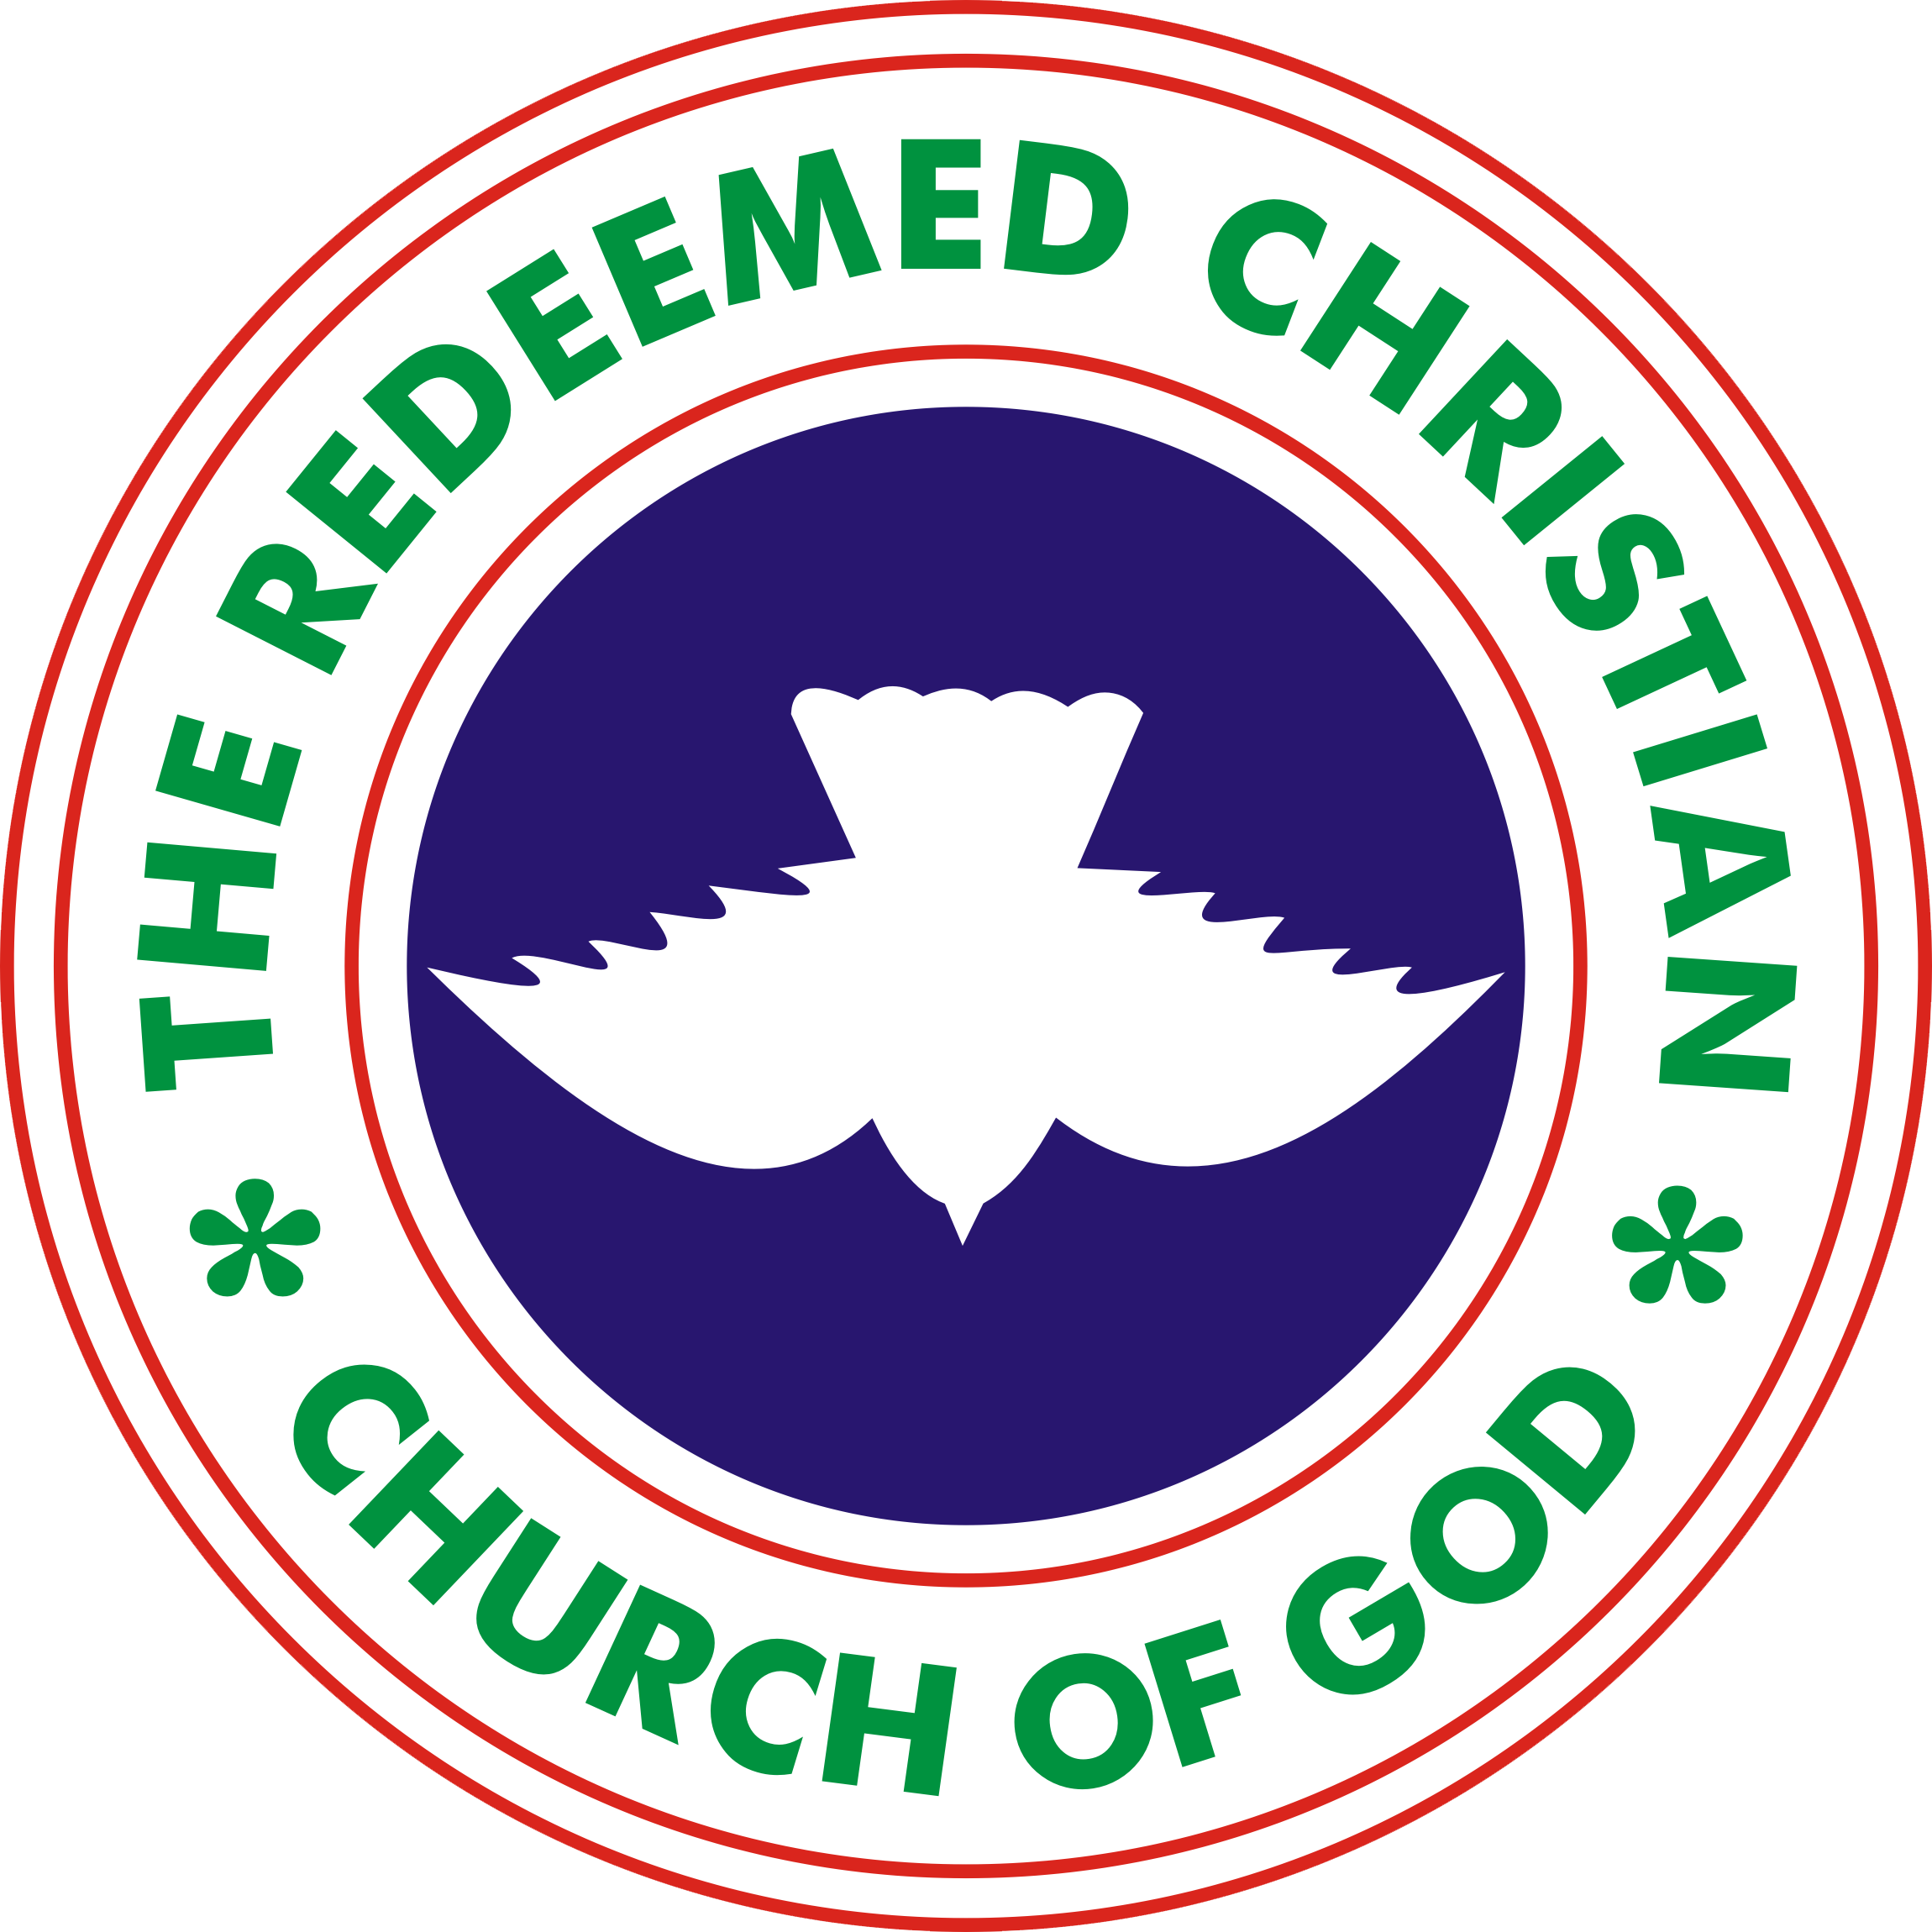 Download Rccg Logo.